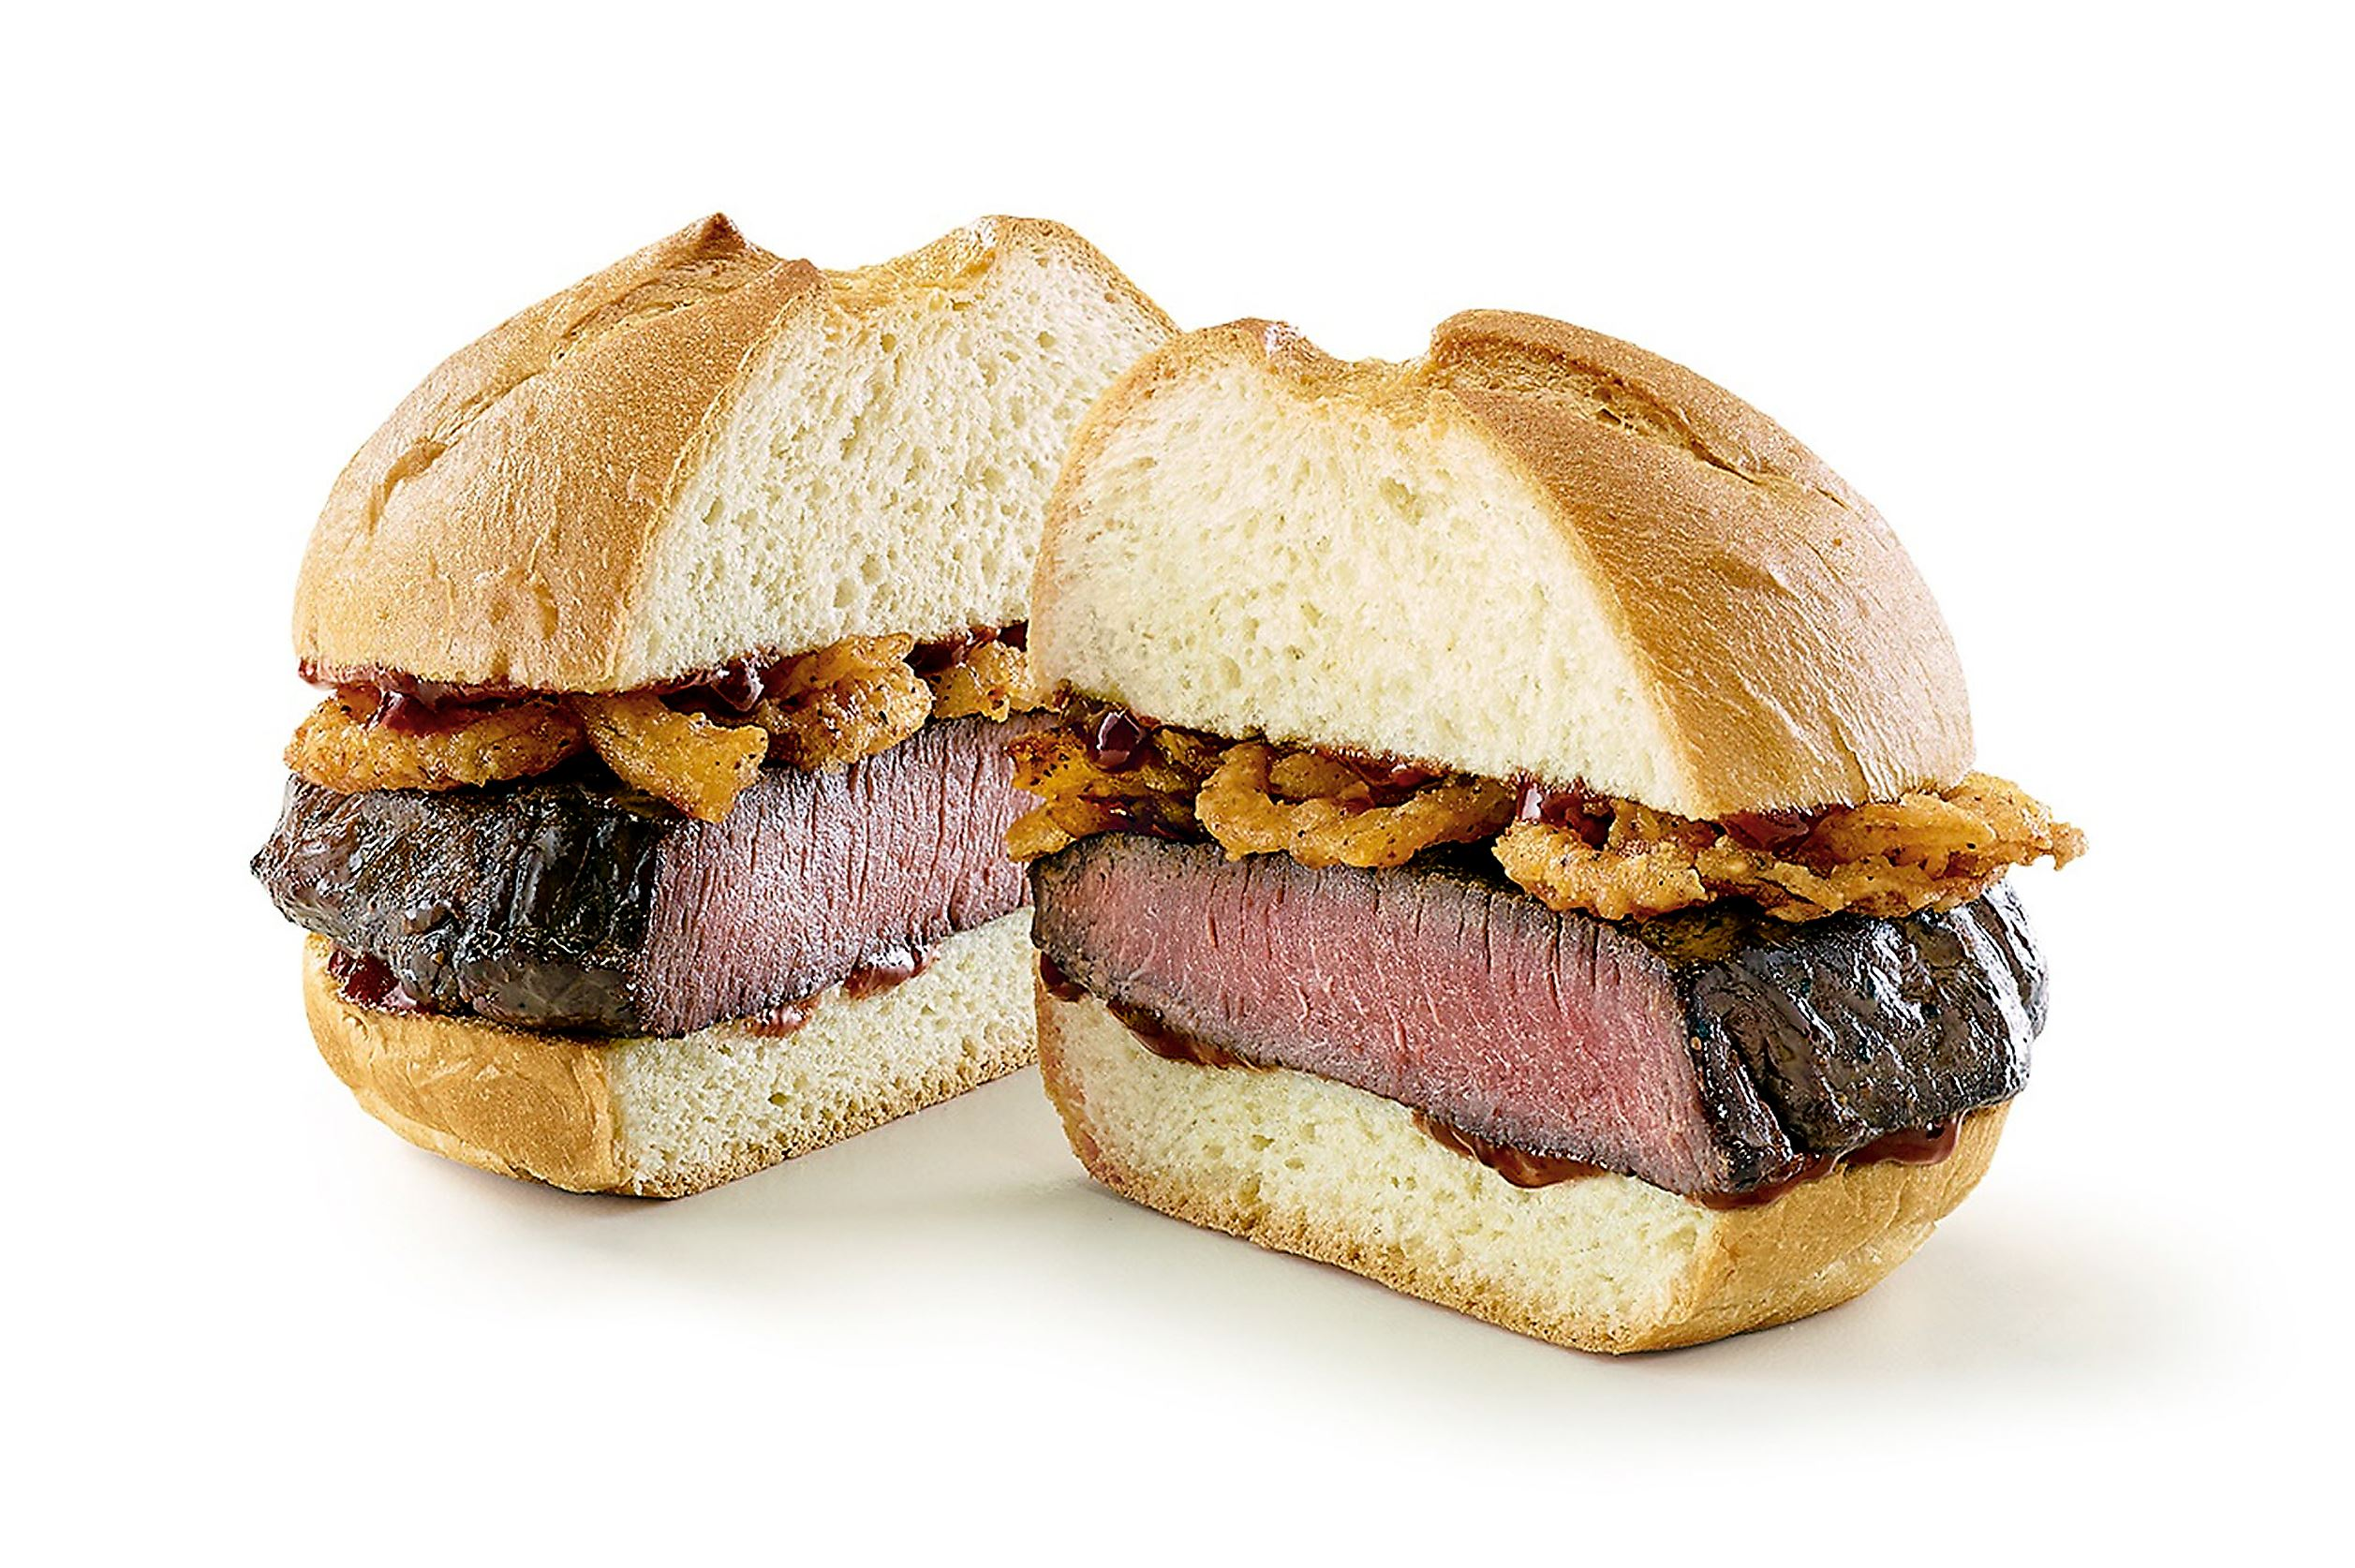 venison_arby_sandwich Arby's venison sandwich features a thick-cut. slow-roasted venison steak and crispy onions topped with juniper berry sauce.